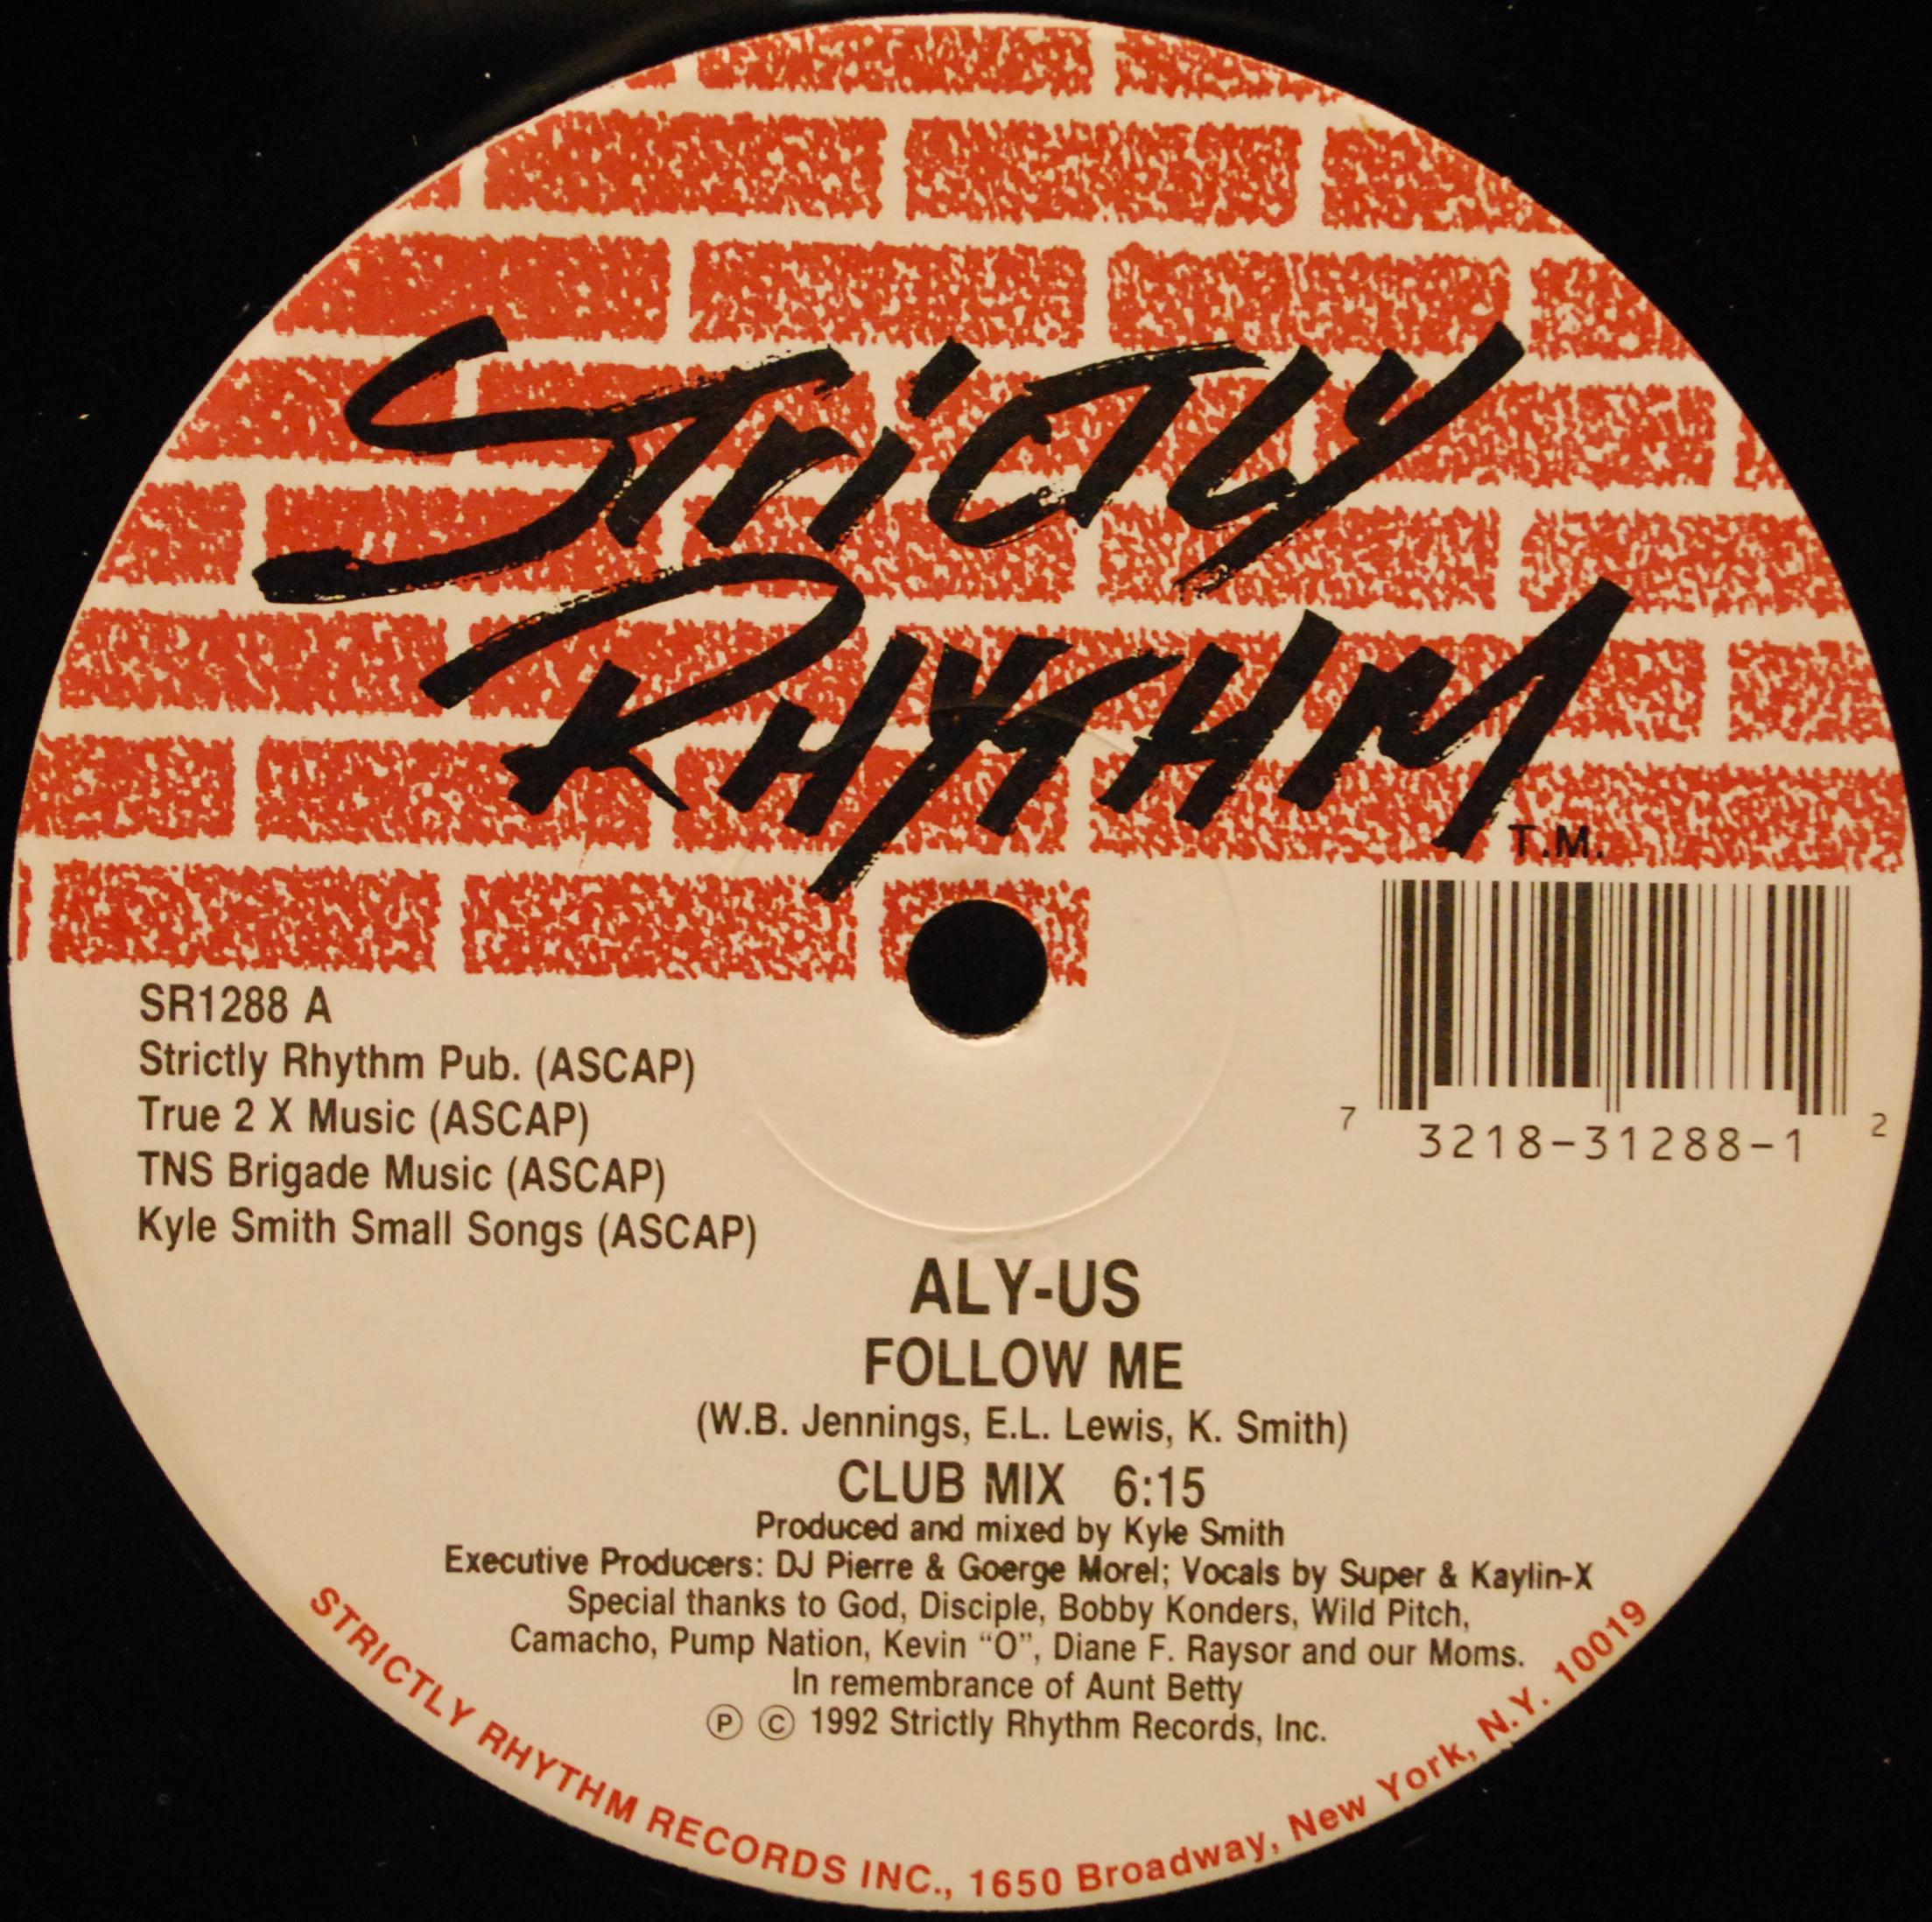 Aly-Us - Follow Me (Remixes)